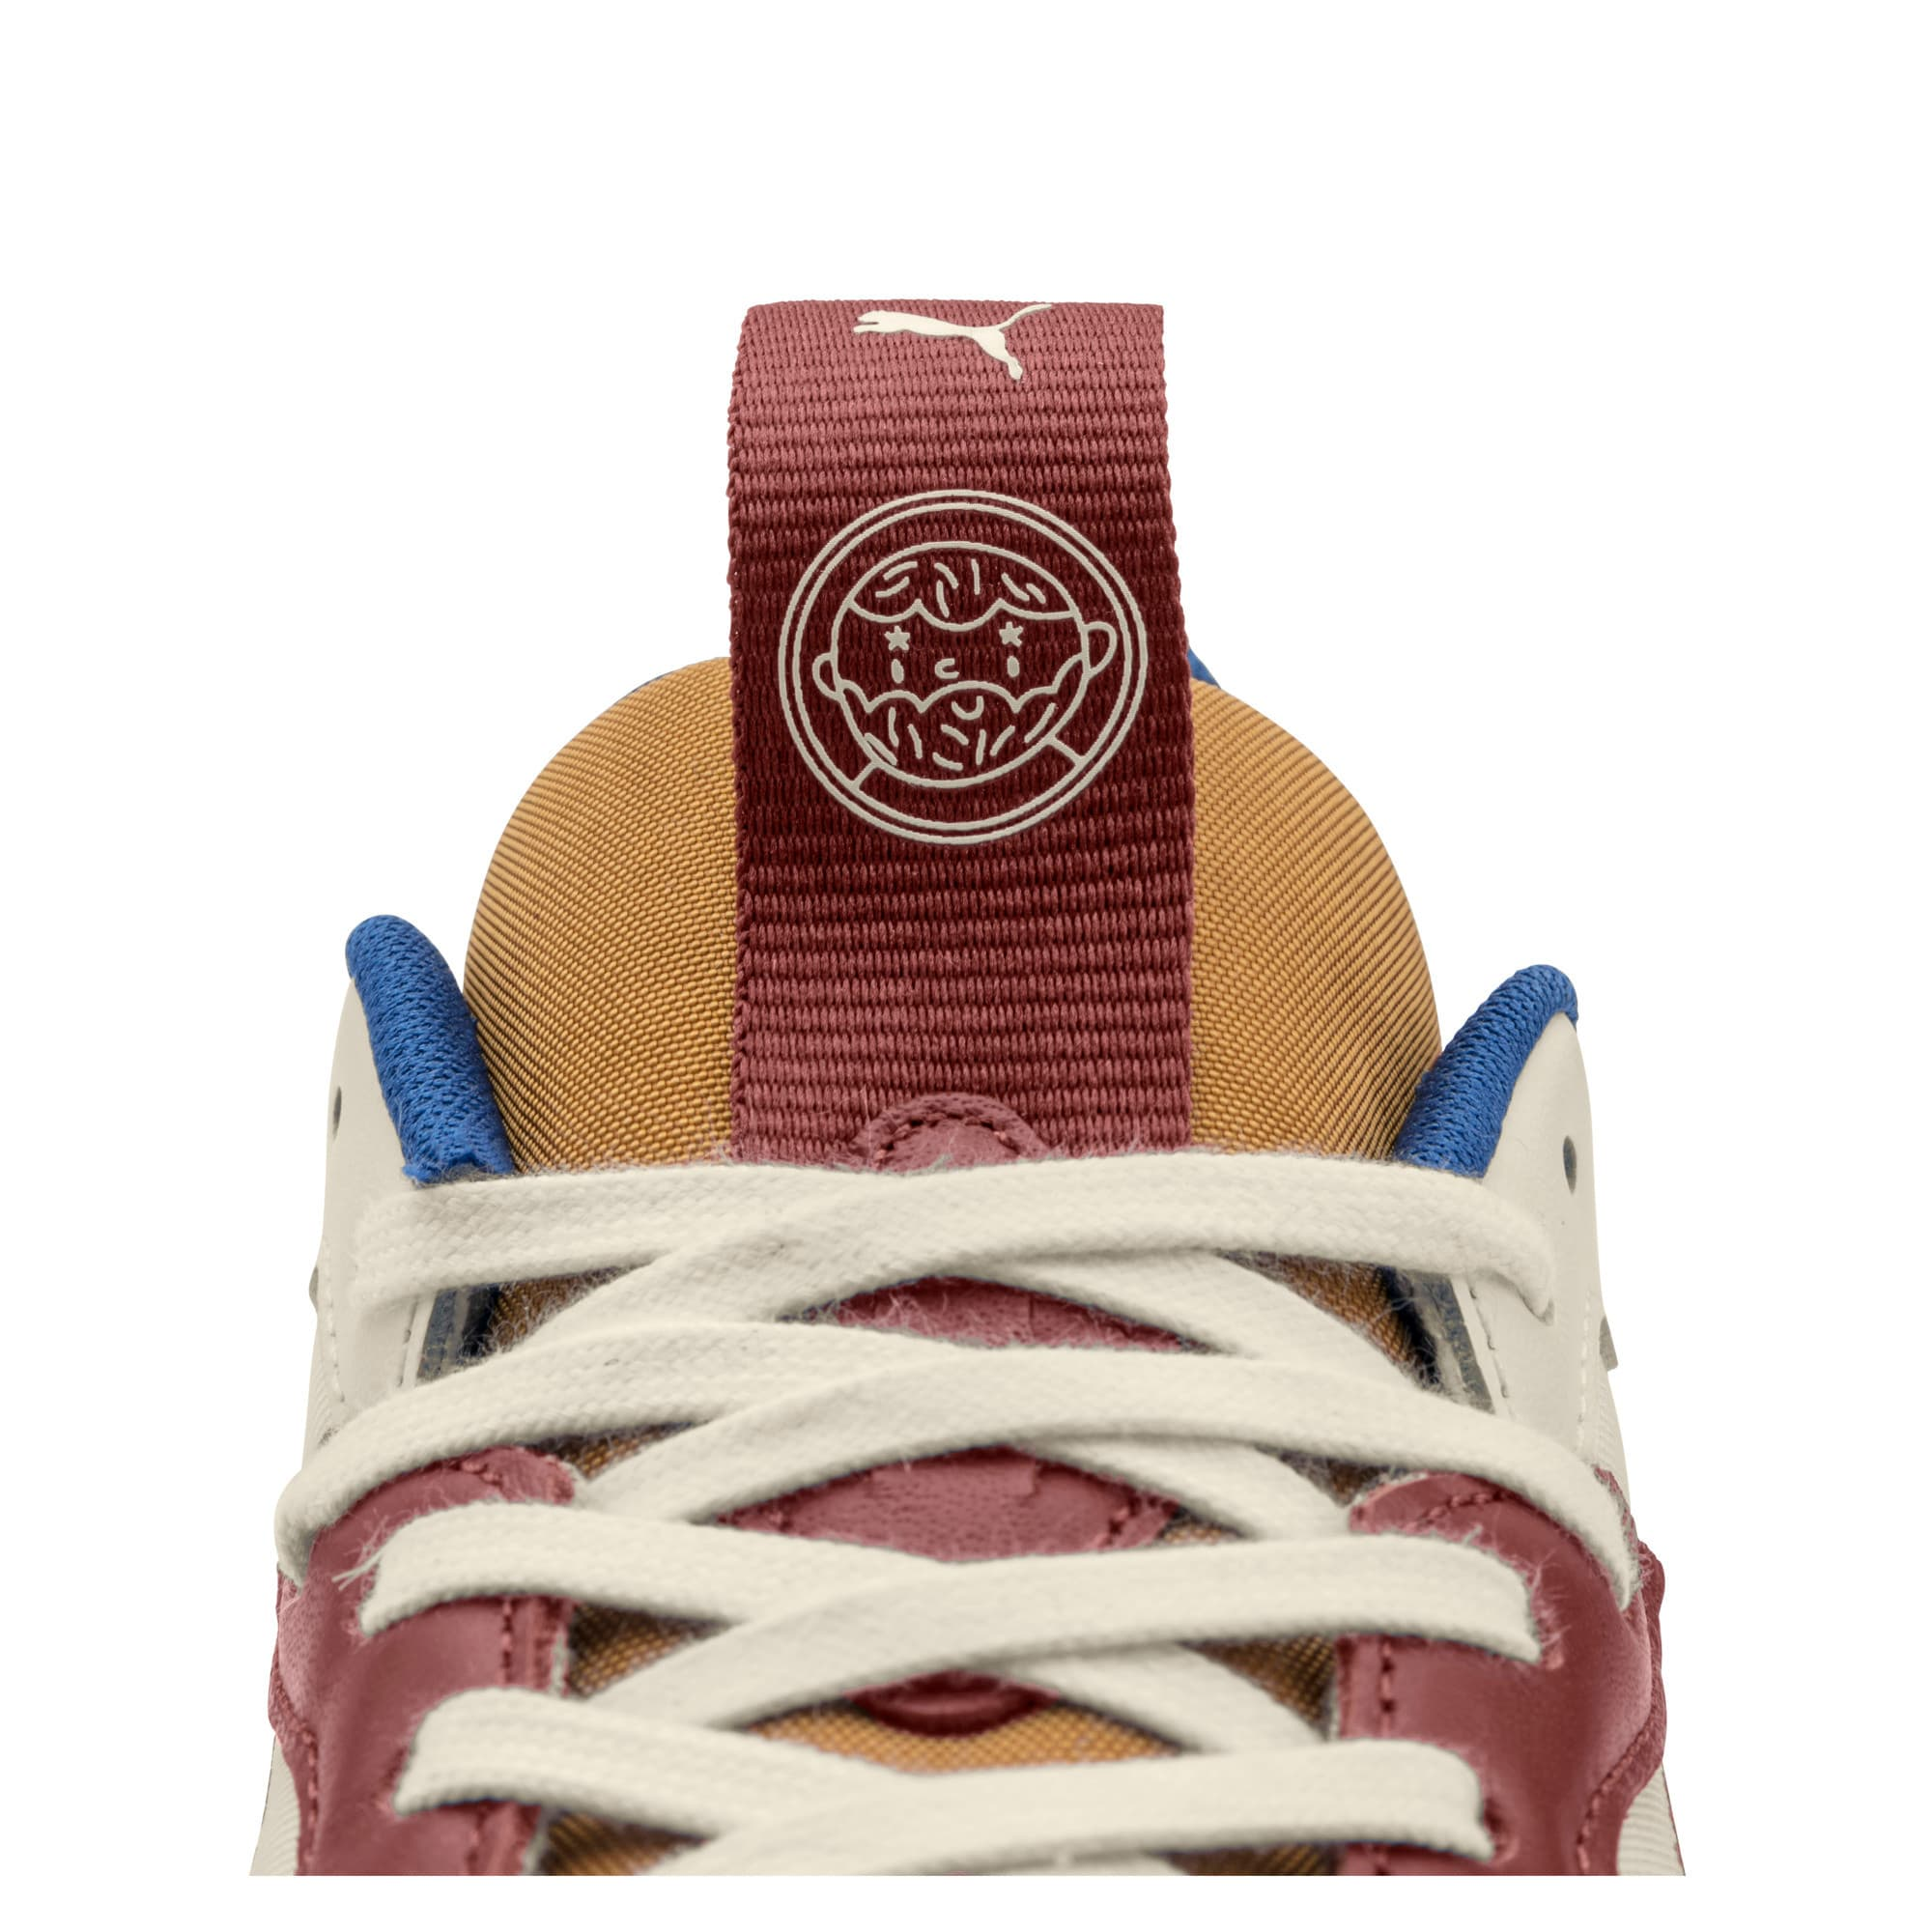 Thumbnail 12 of PUMA x TYAKASHA RS-X Sneakers, Whisper White-Fired Brick, medium